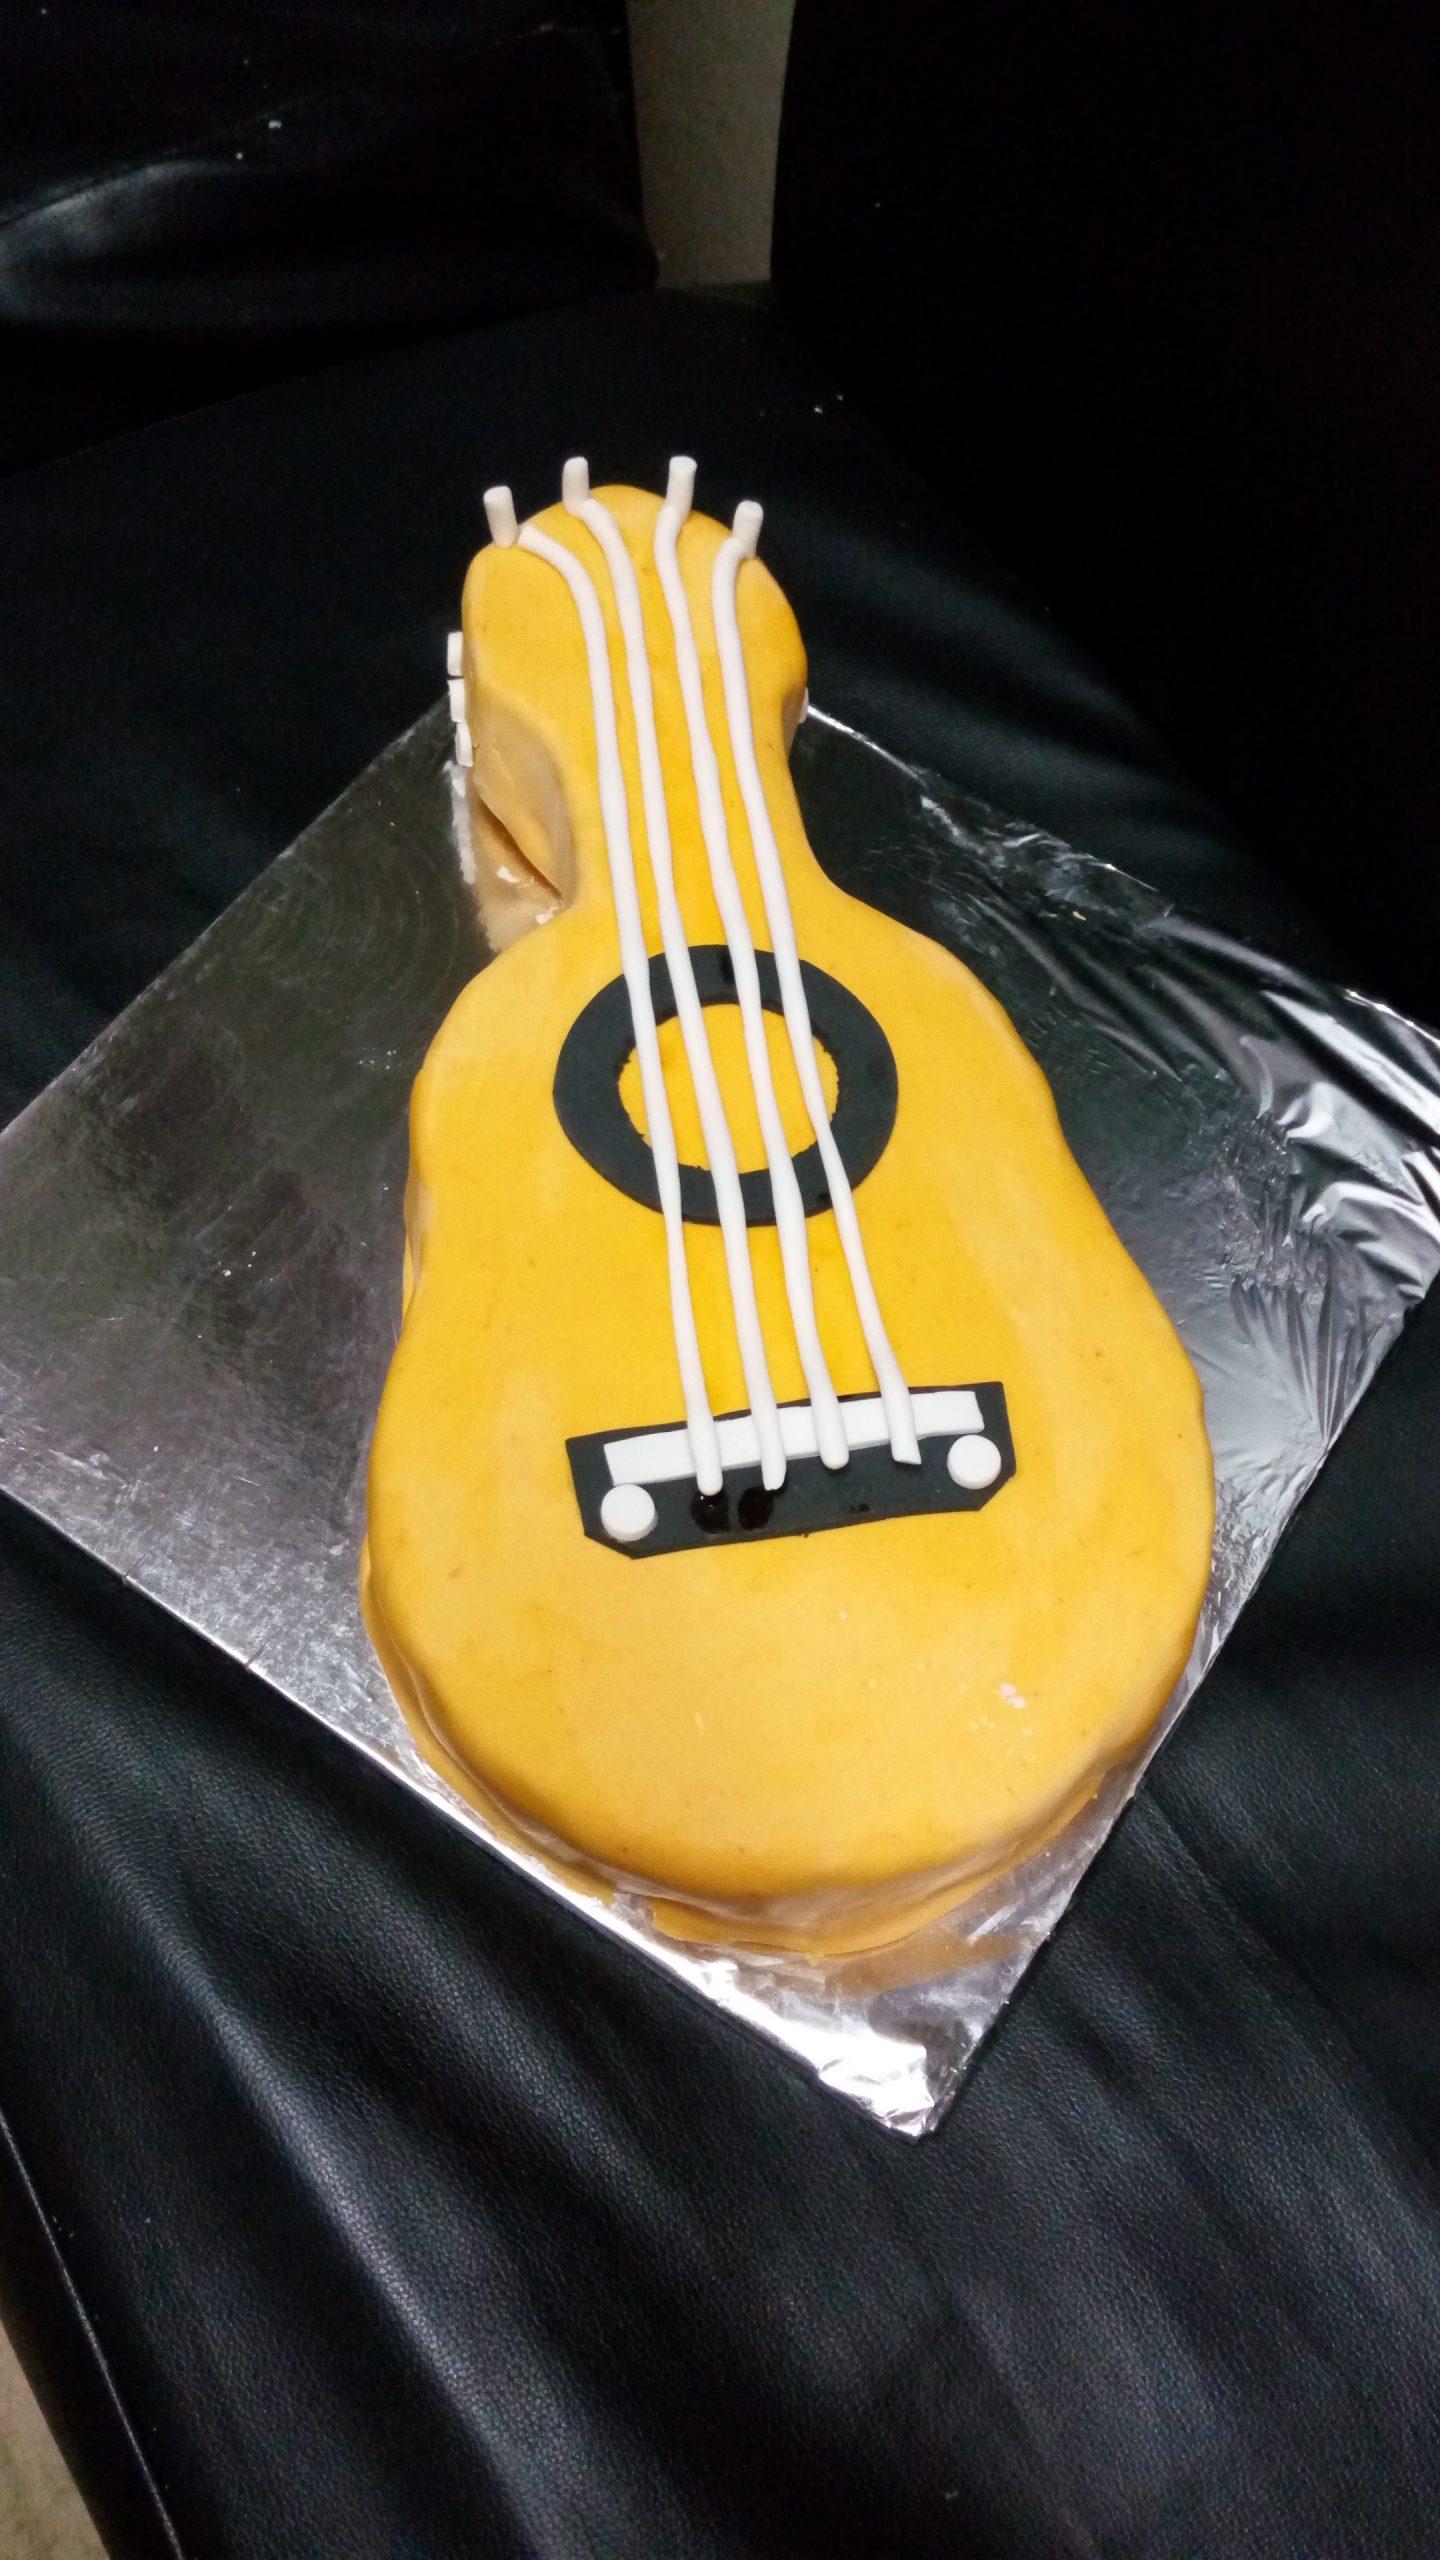 MODERN CAKE MAKING LEVEL 4